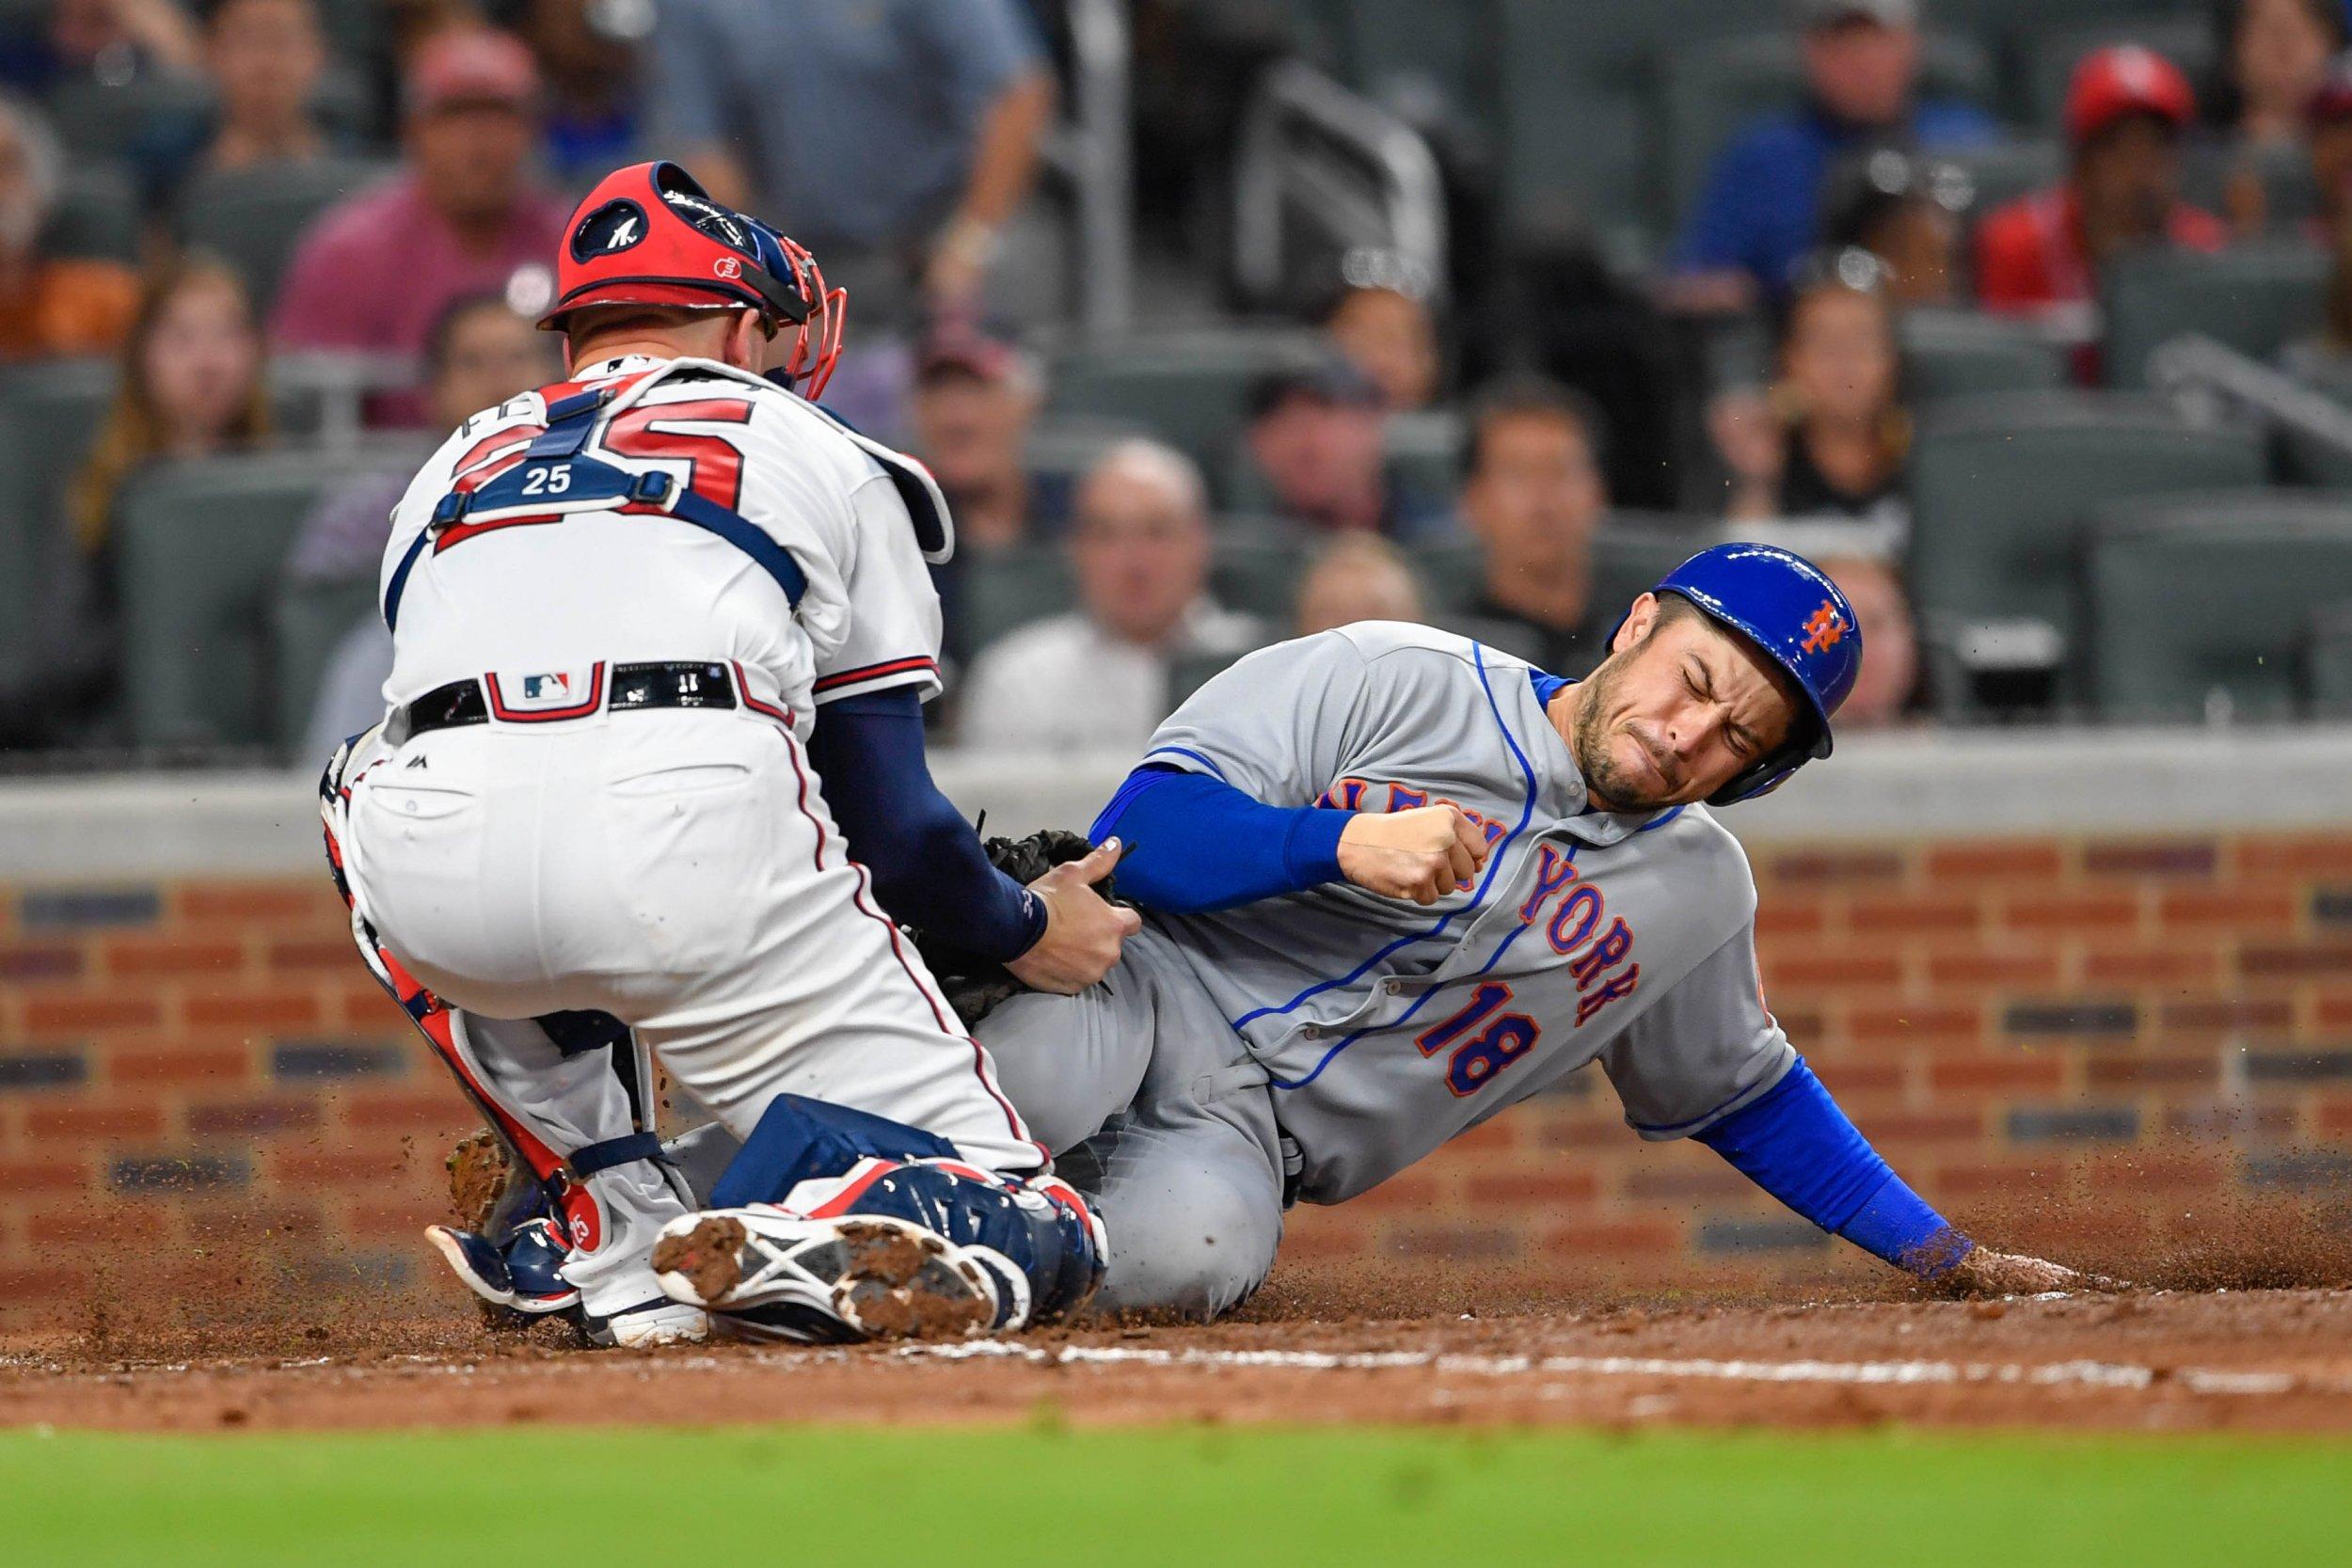 New York Mets catcher Travis d'Arnaud, right, slides under the tag by Atlanta Braves catcher Tyler Flowers at SunTrust Park, Atlanta, May 1 2017.